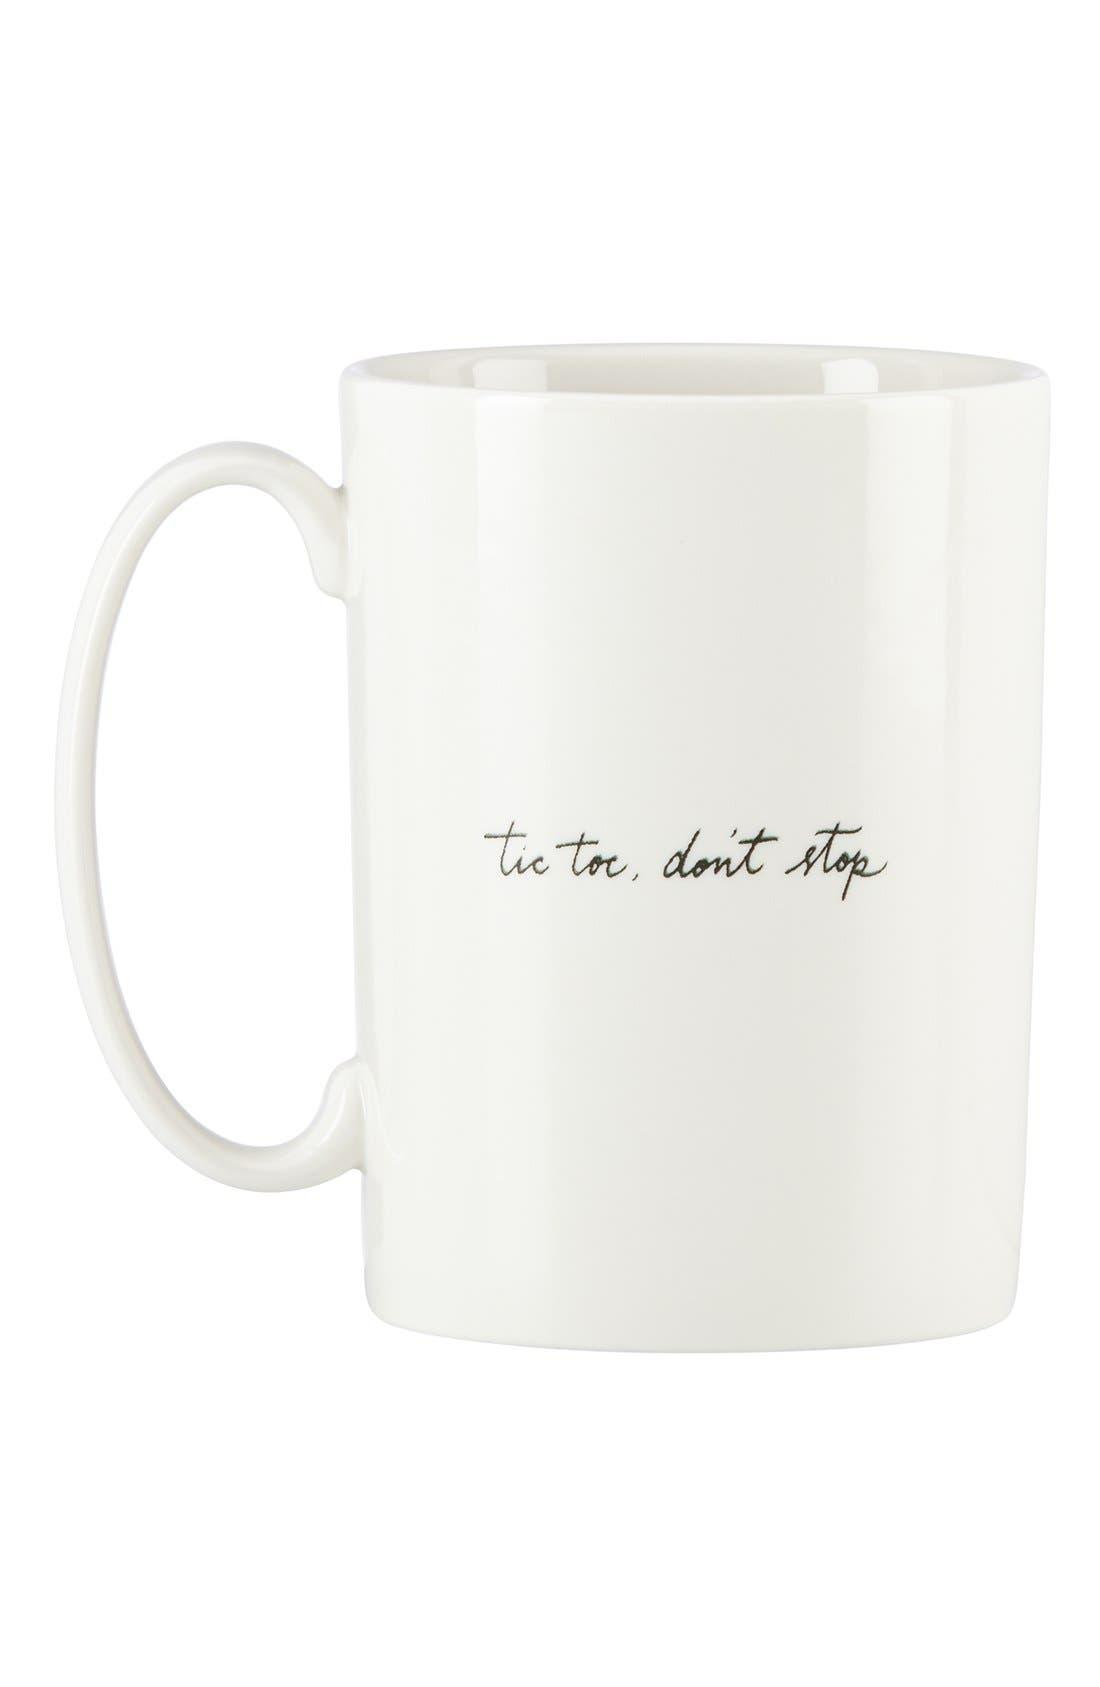 'snap happy - tic toc' porcelain mug,                             Alternate thumbnail 2, color,                             100